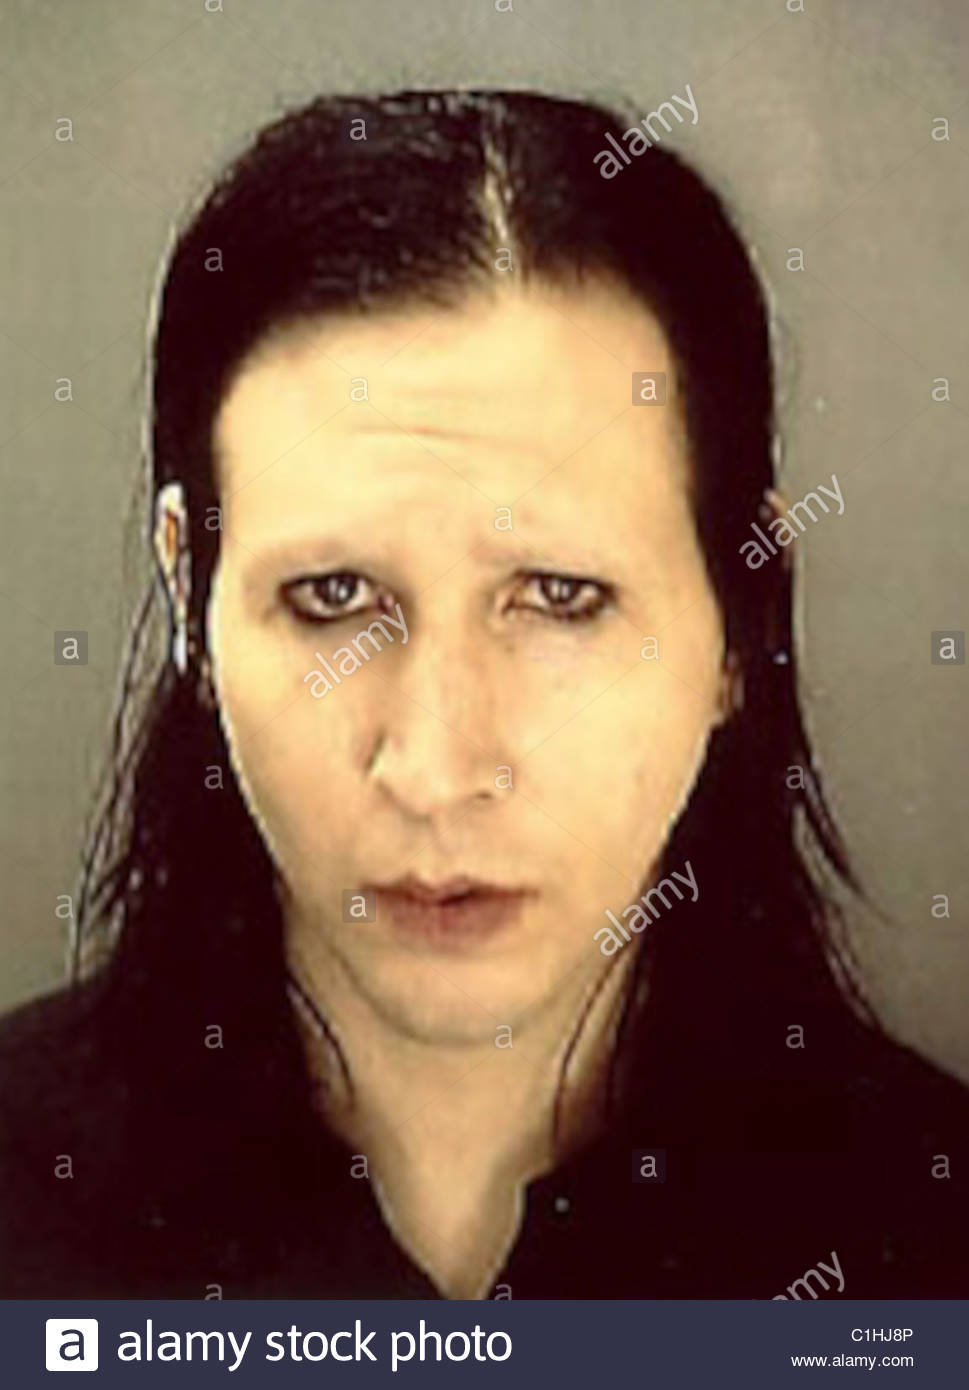 Marilyn Manson Mugshot Stockfoto Bild 35422934 Alamy